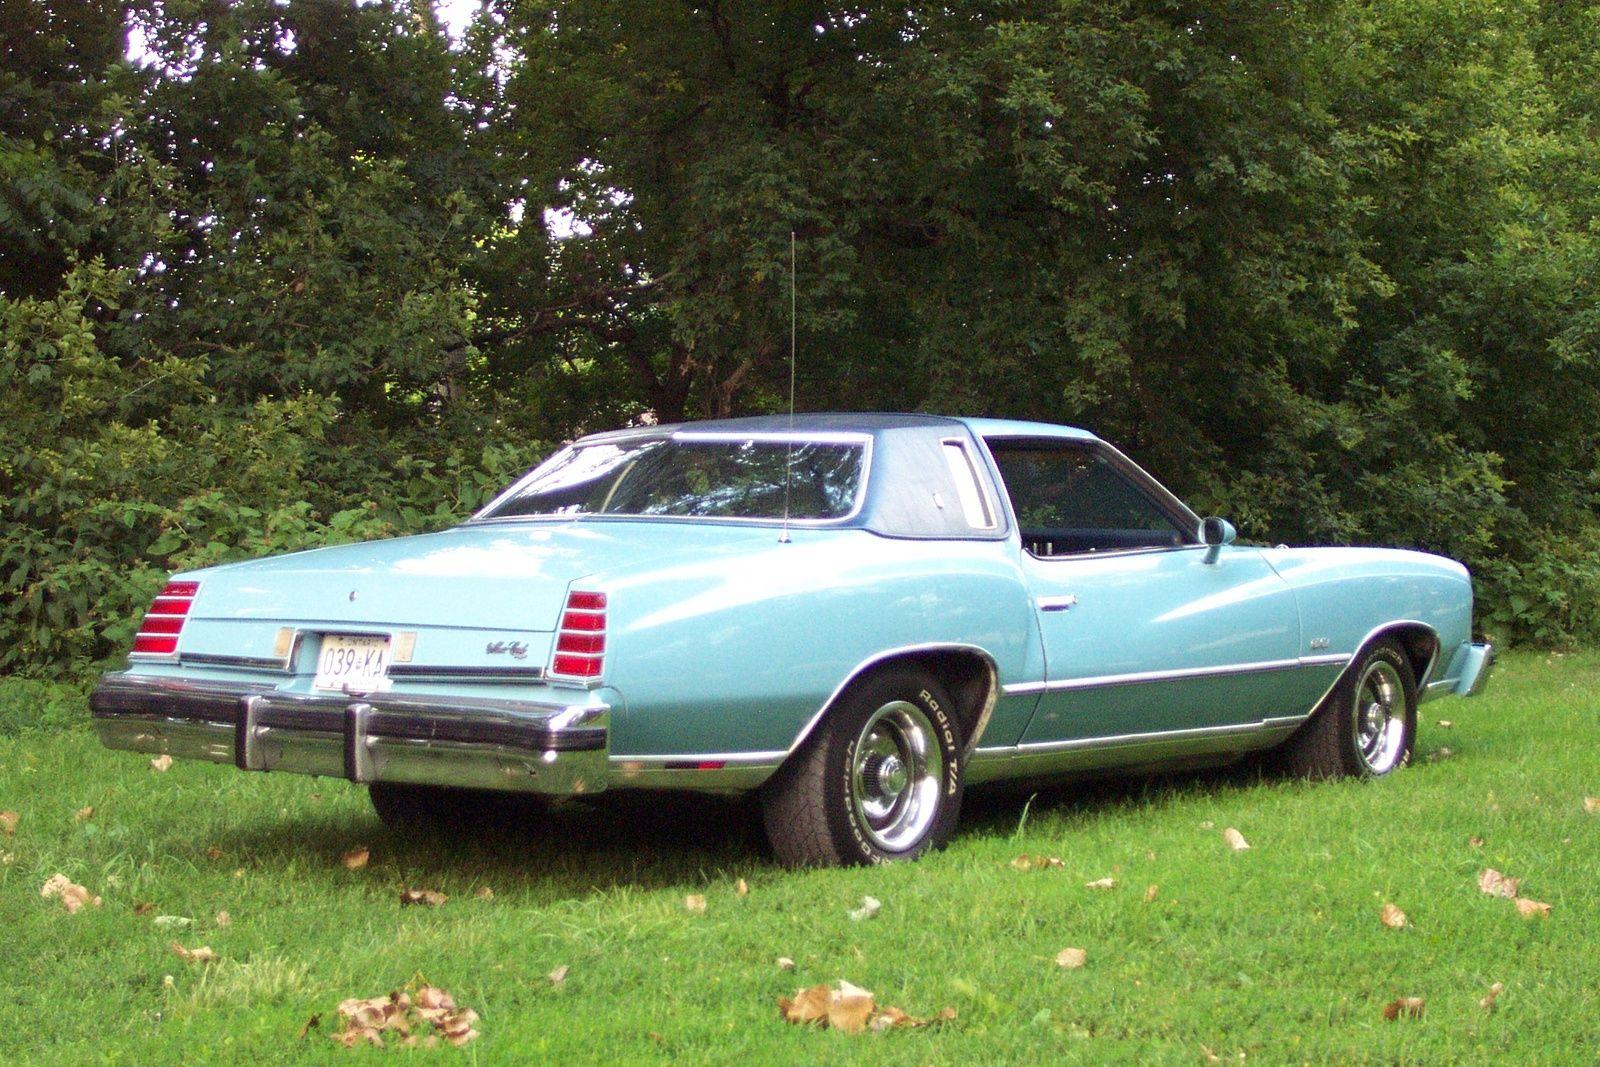 1975 Chevrolet Monte Carlo Chevrolet Monte Carlo Chevrolet